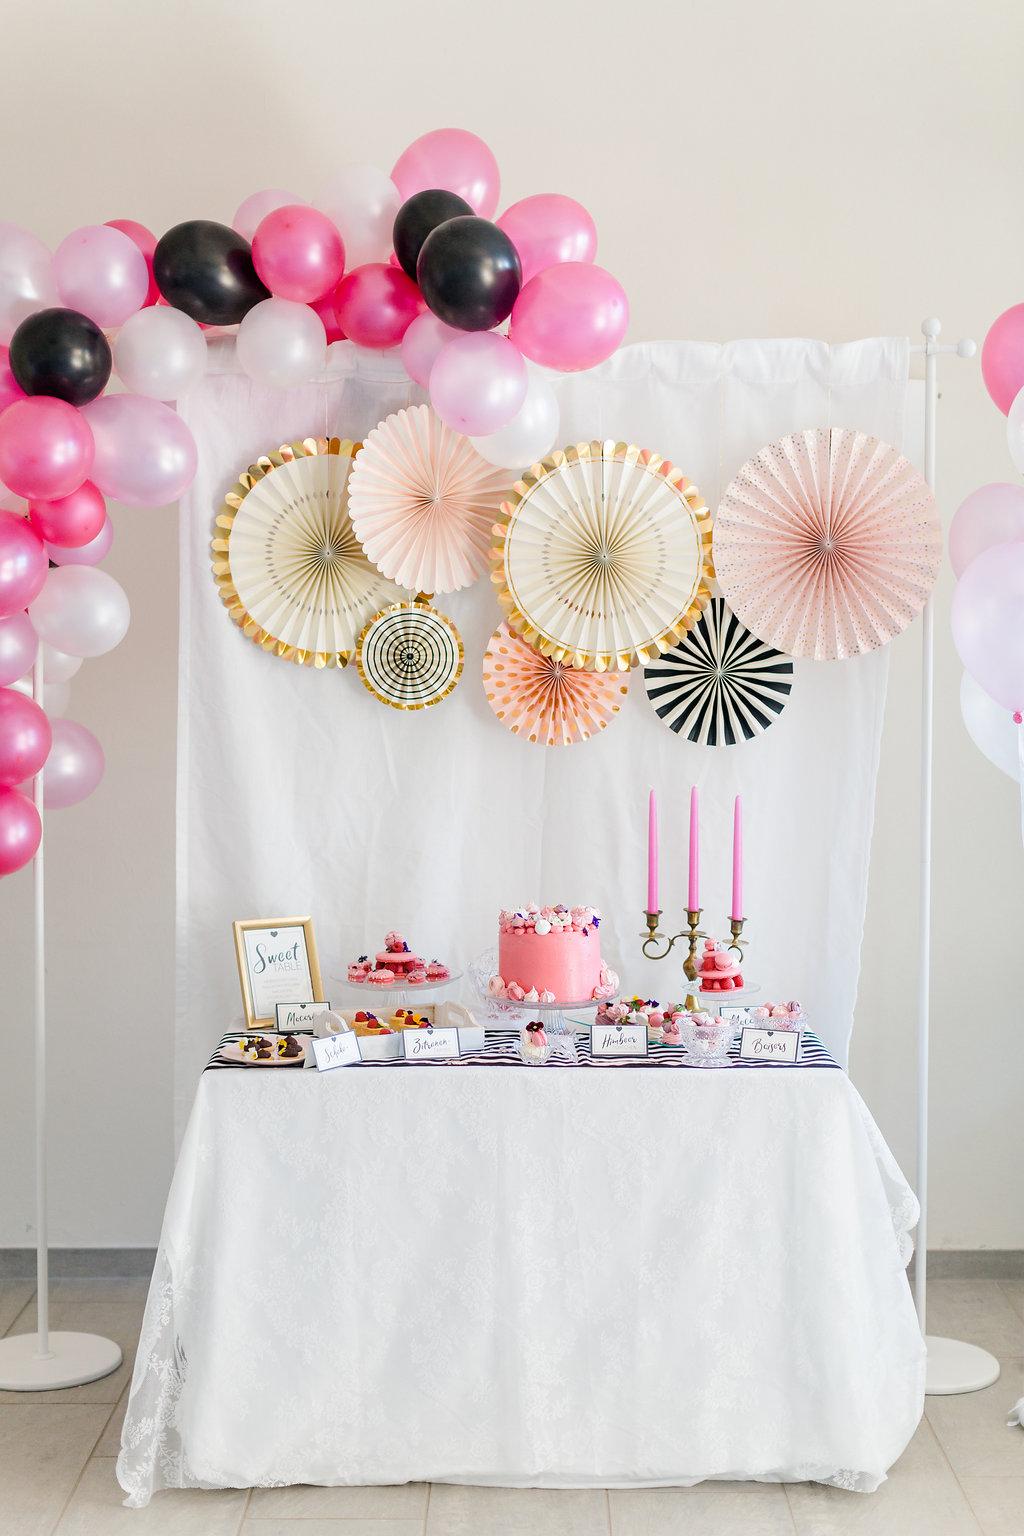 Sweet Table Hochzeit, Sweet Table Brautparty, Junggesellinnenabschied Torte Pink